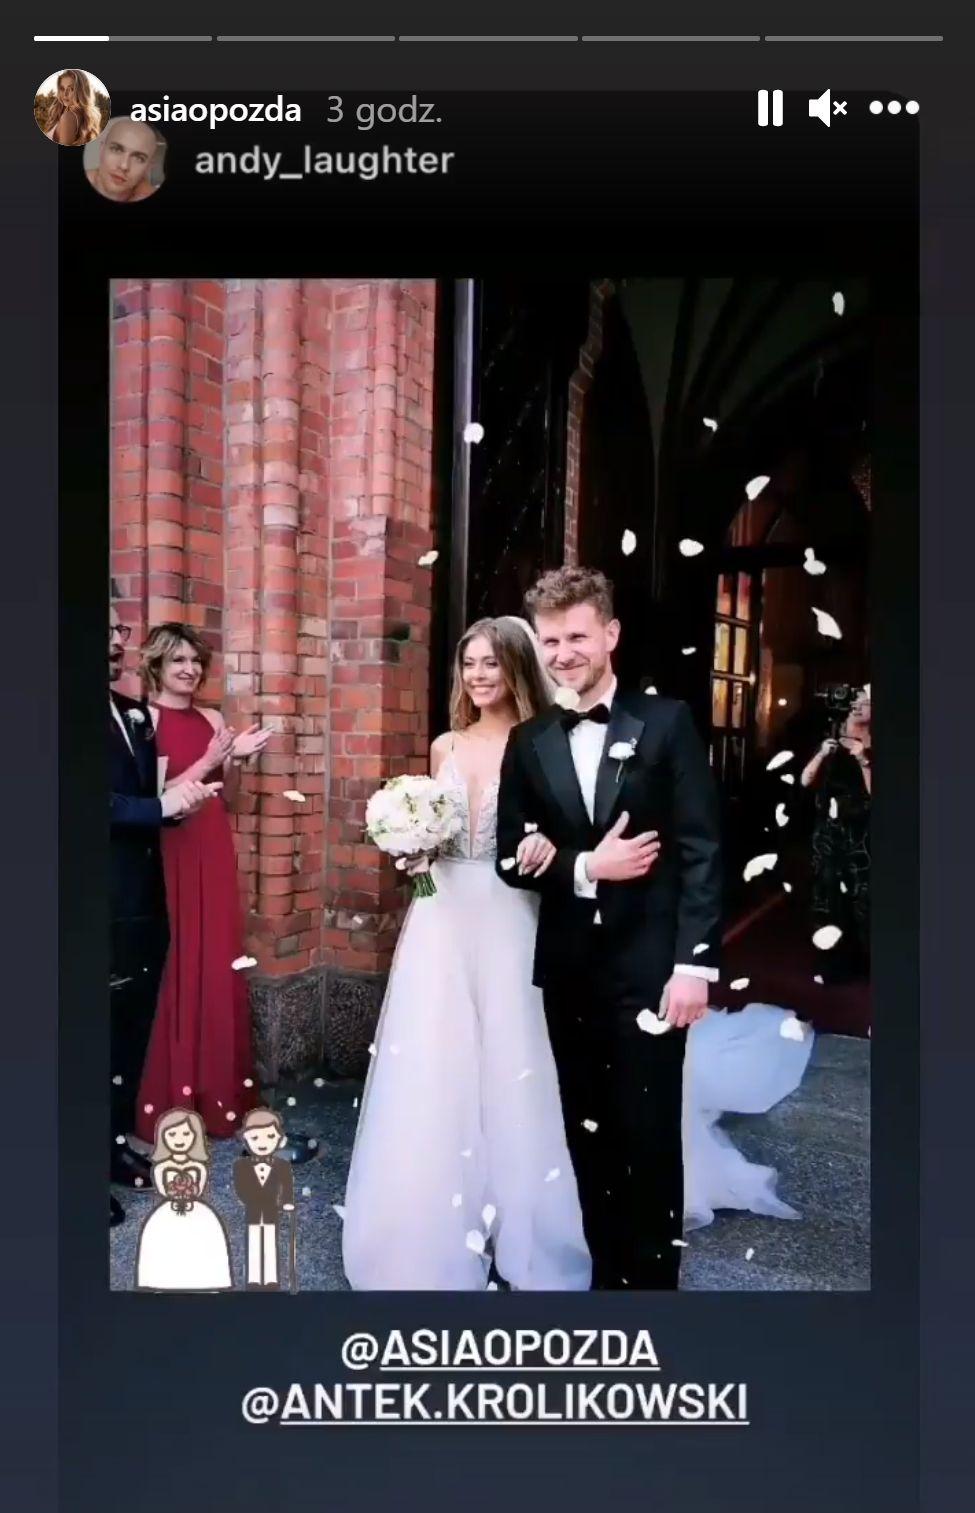 Joanna Opozda i Antek Królikowski - ślub